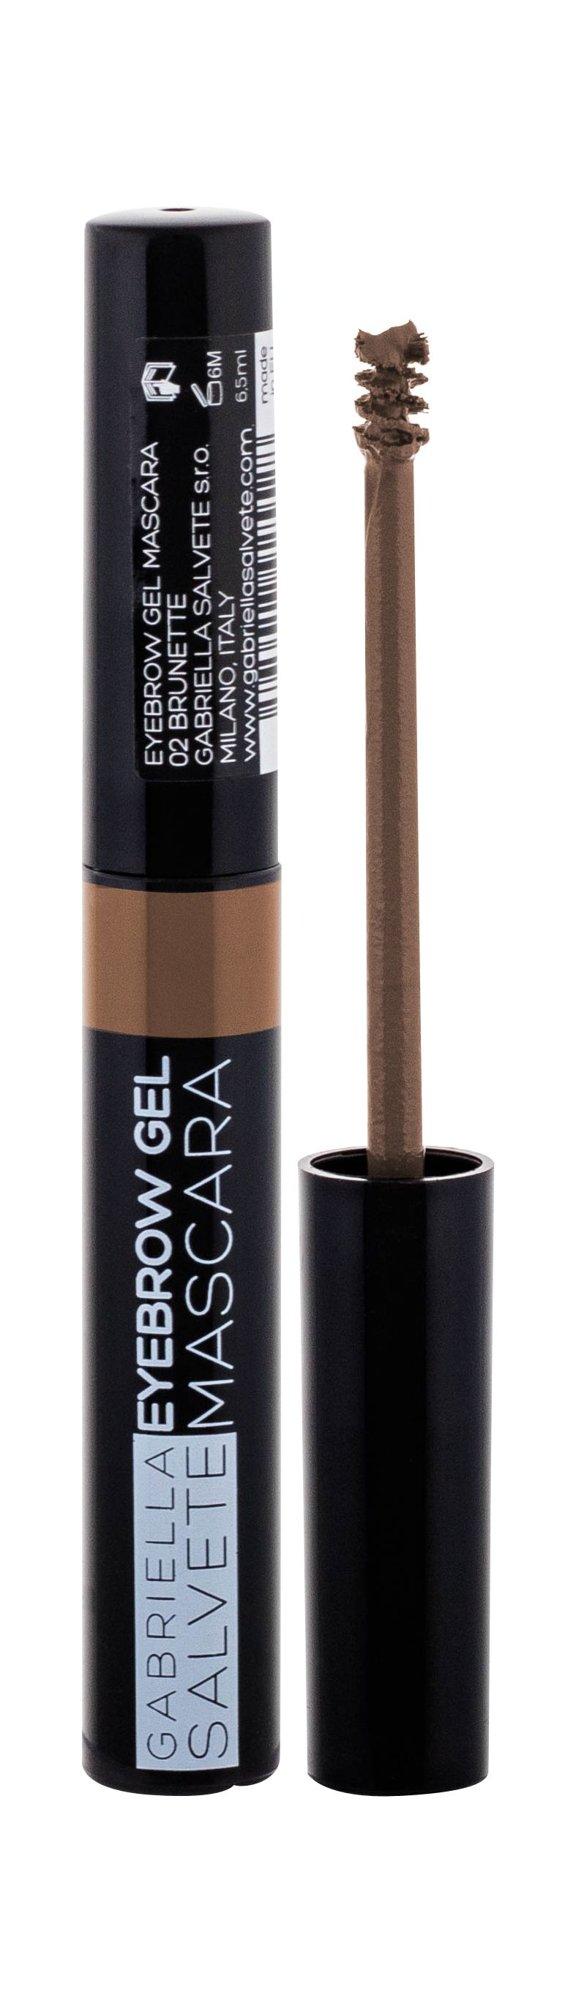 Gabriella Salvete Eyebrow Gel Eyebrow Mascara 6,5ml 01 Light Brown